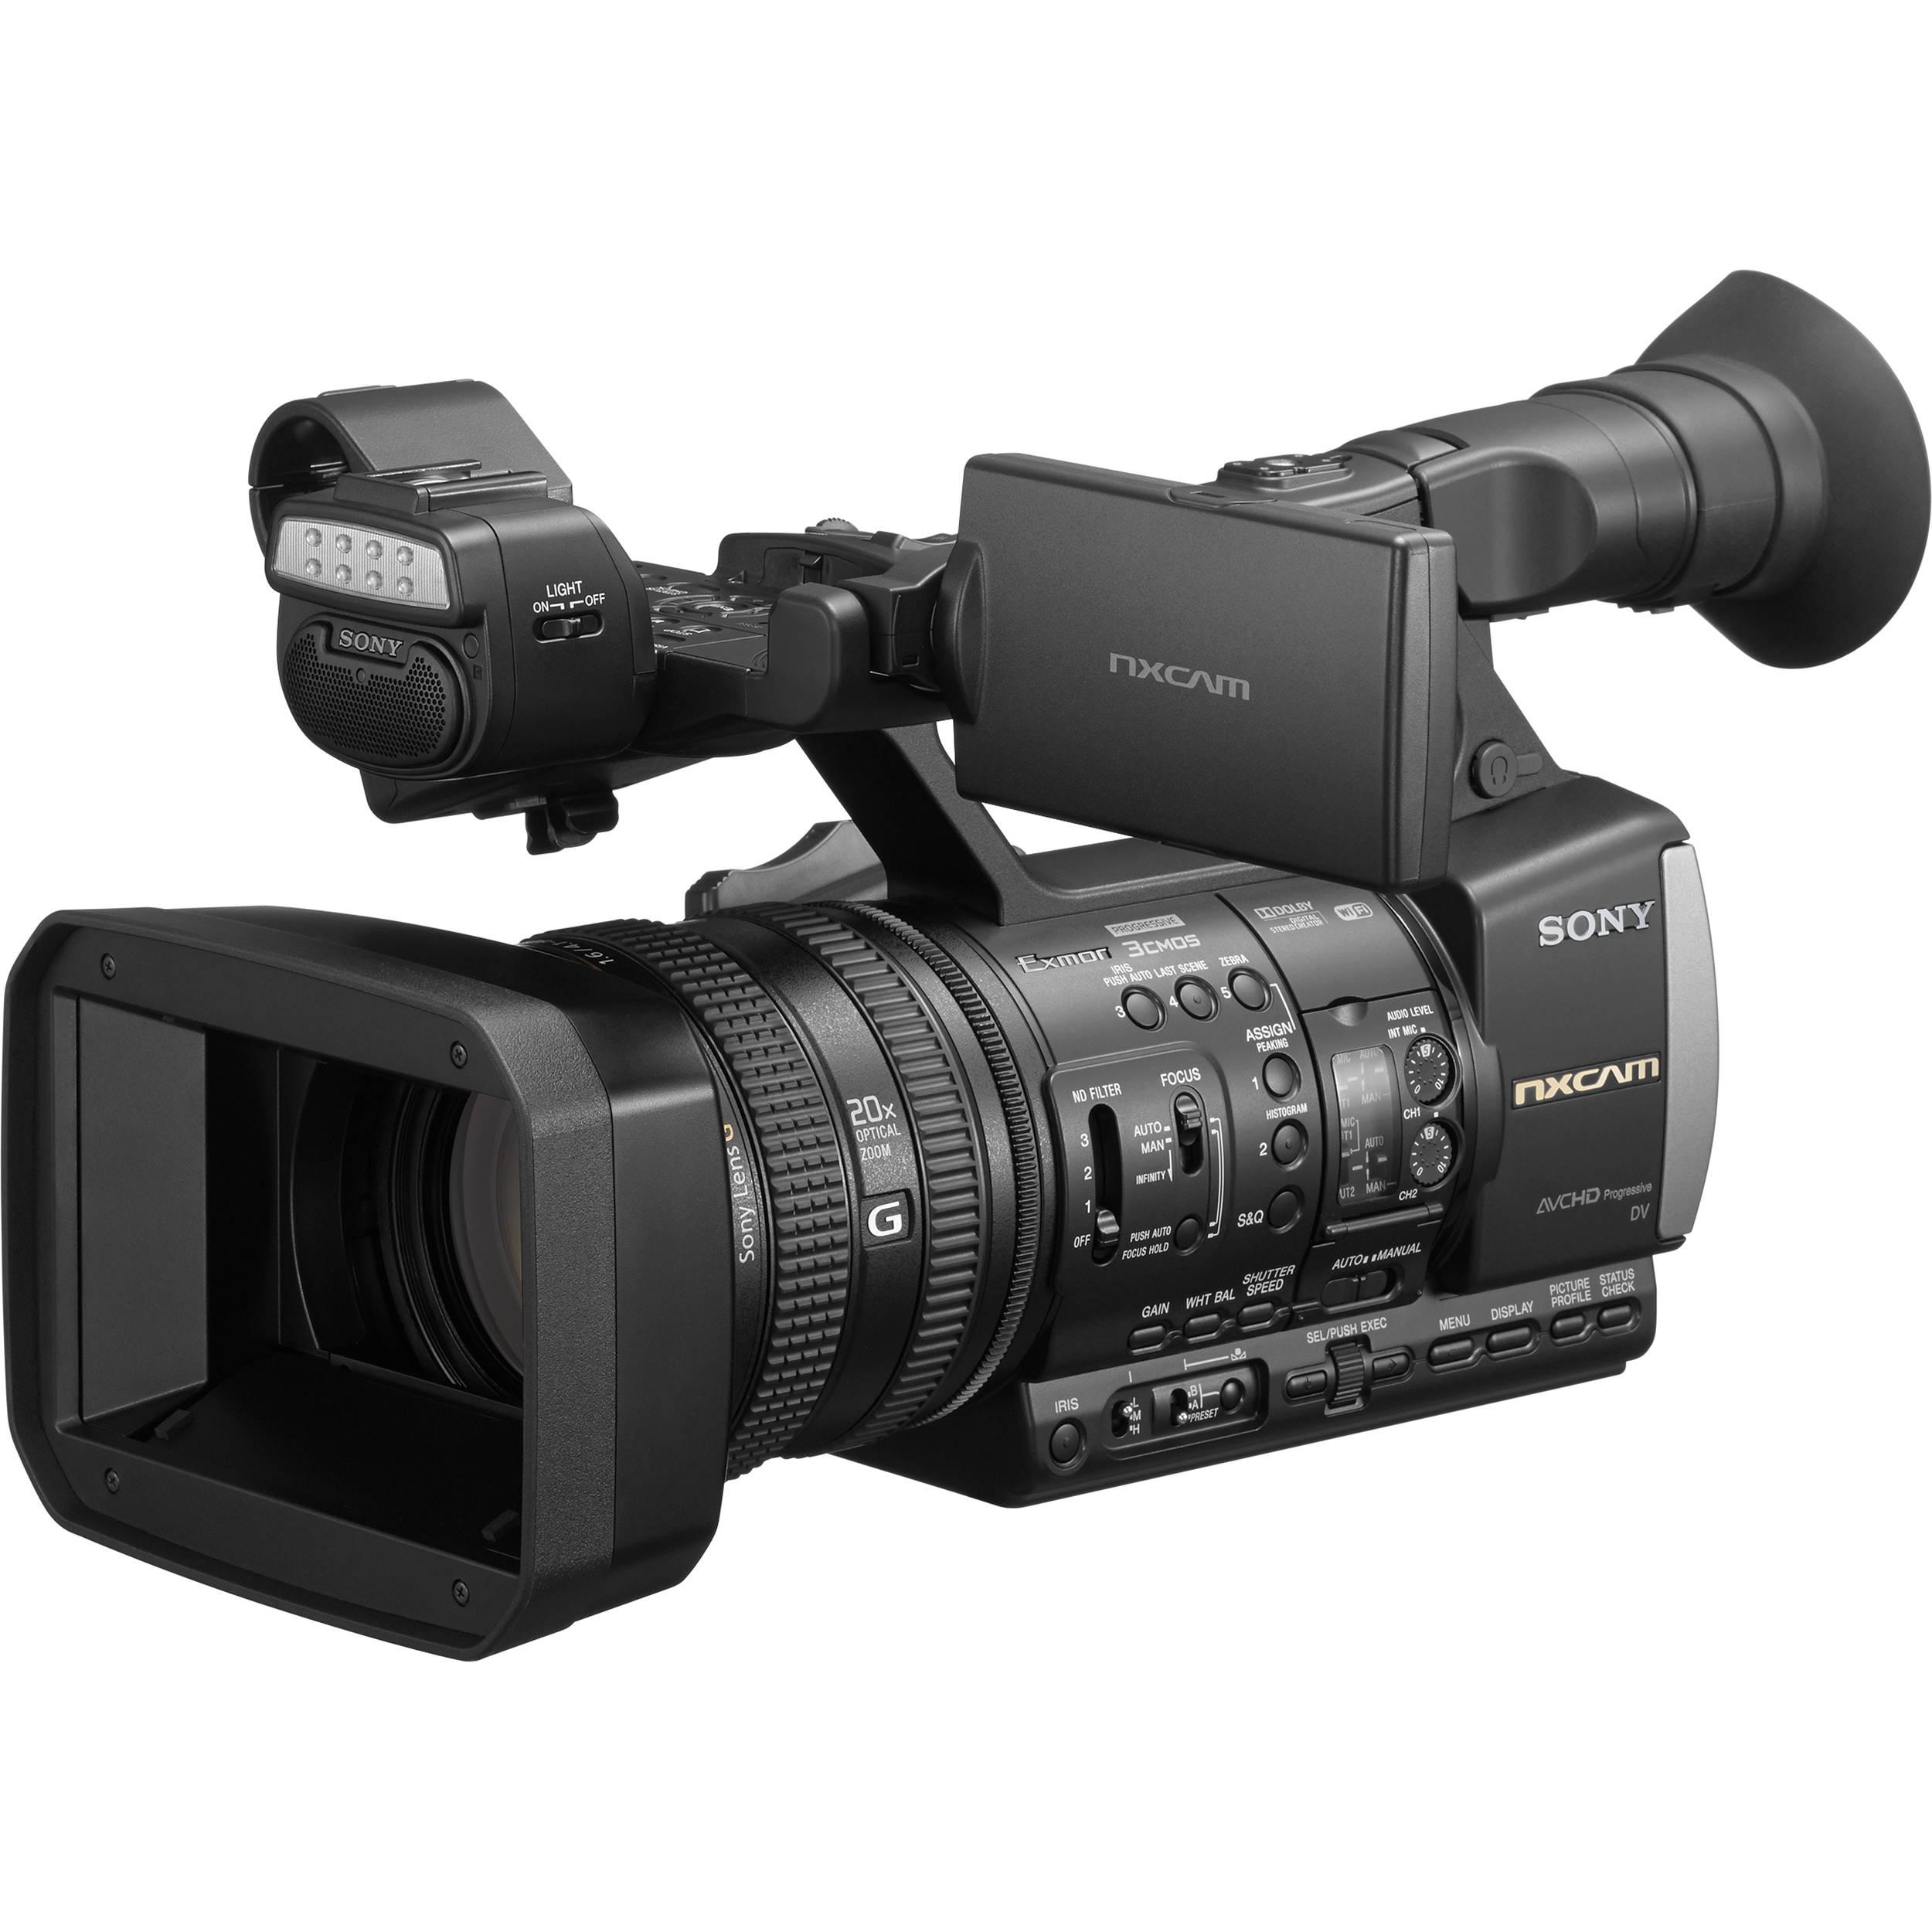 sony hxr nx3 1e hxr nx3 1 nxcam professional handheld 1084879 Sony HXR NX3/1 NXCAM Professional Handheld Camcorder